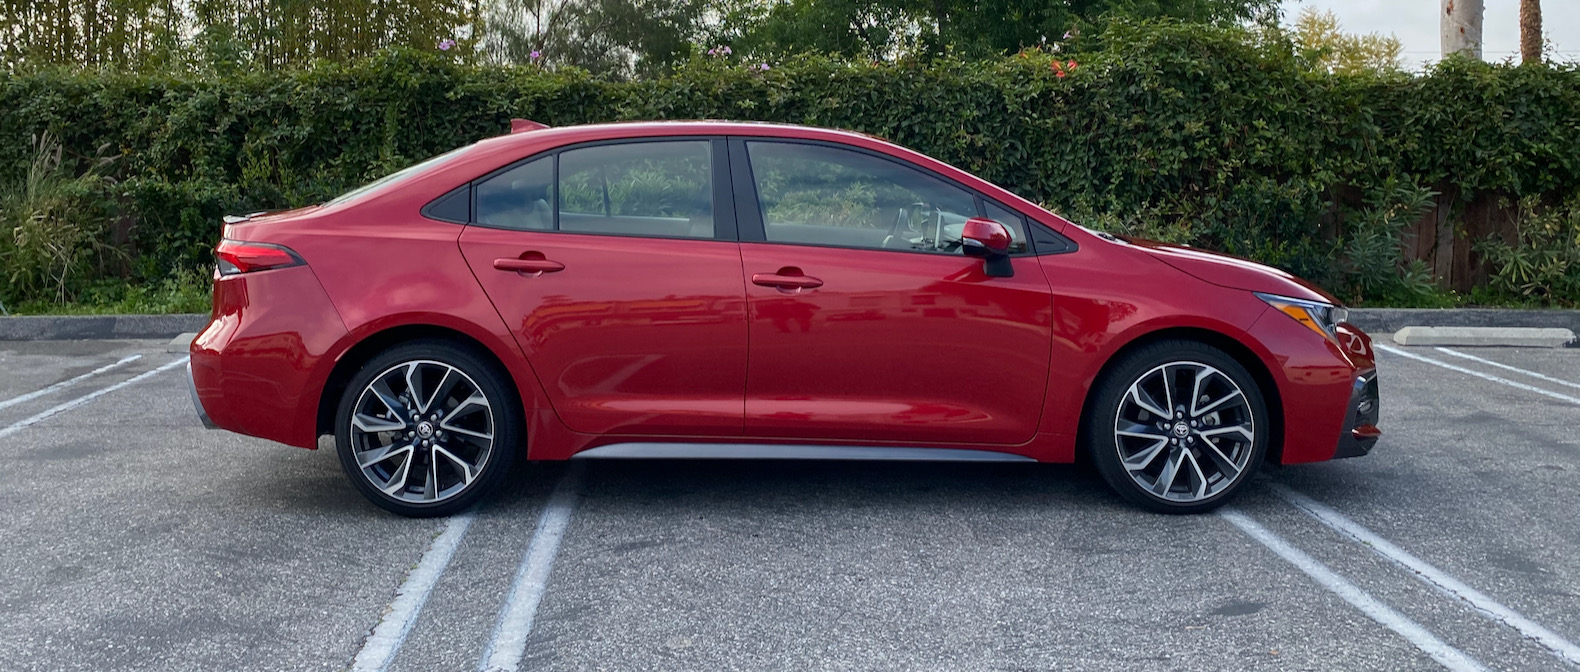 2021 Toyota Corolla Review